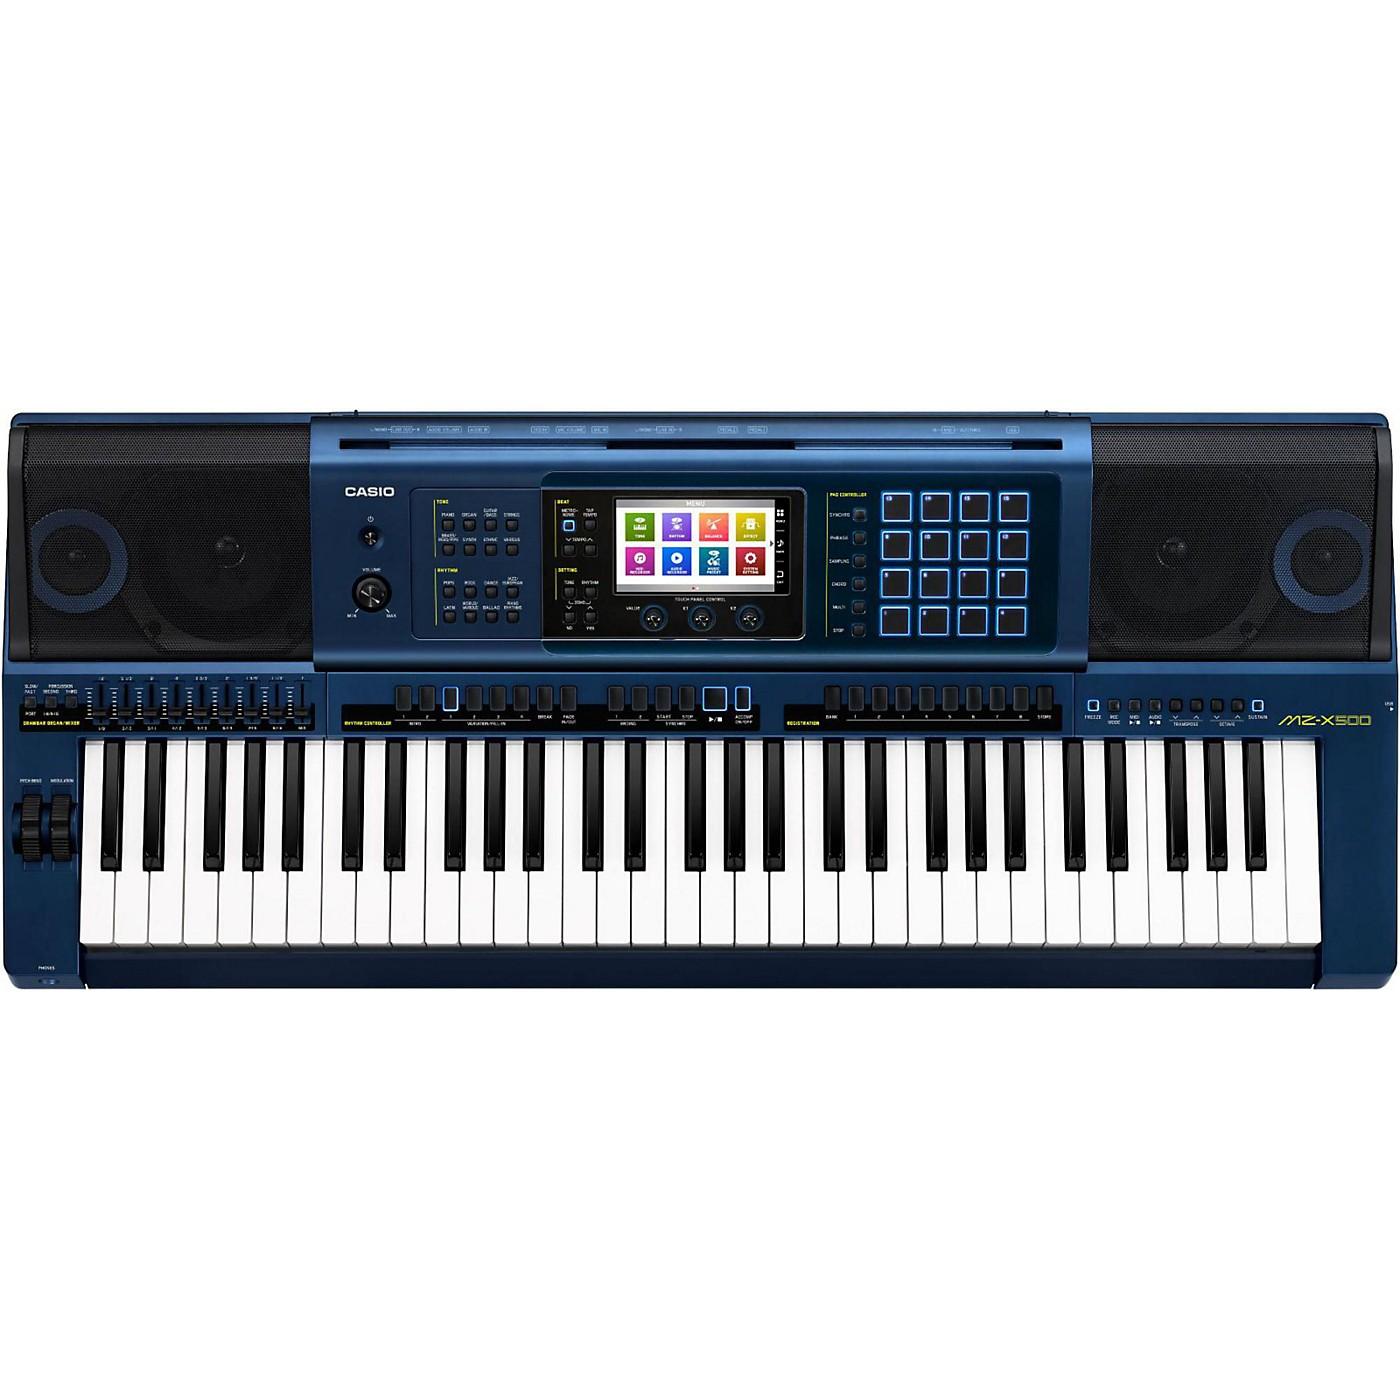 Casio MZ-X500 Music Arranger thumbnail